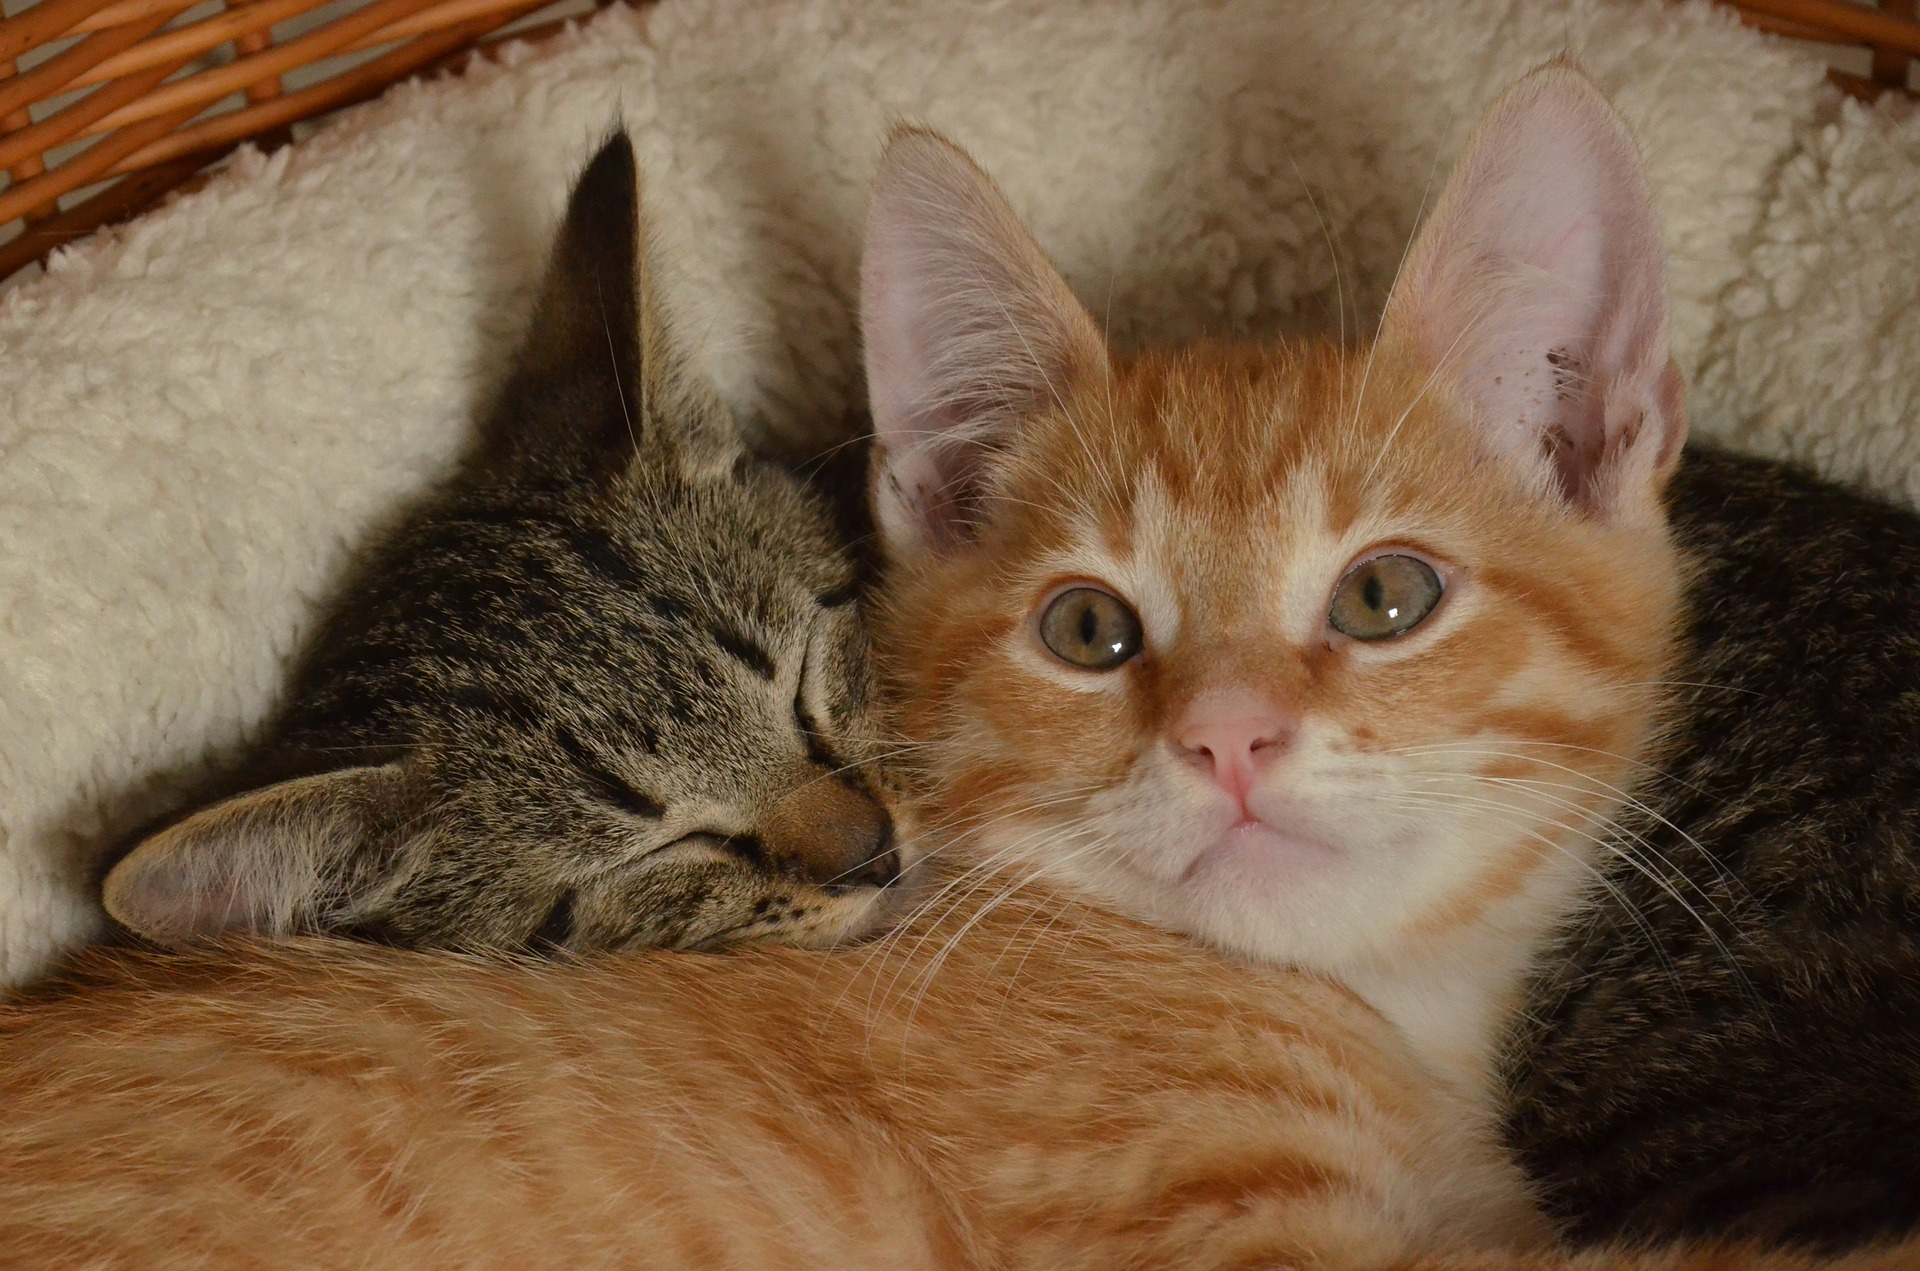 kedi davranislari ve anlamlari